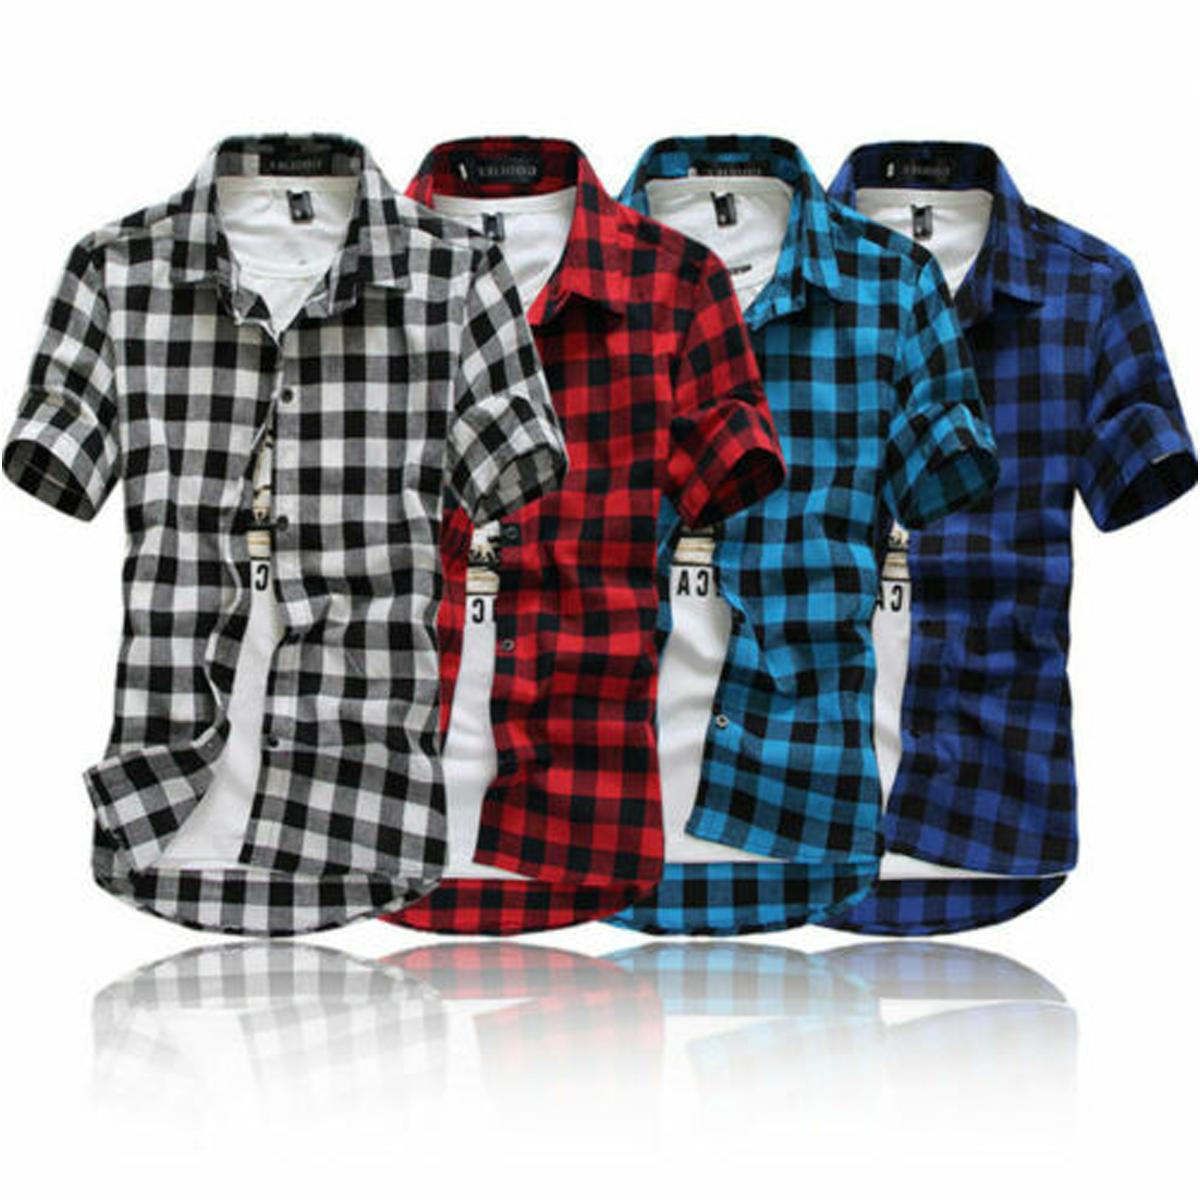 Merqwadd Men S Summer Casual Dress Shirt Mens Plaid Short Sleeve Shirts Tops Walmart Com Mens Shirt Dress Mens Shirts Plaid Shirt Men [ 1200 x 1200 Pixel ]